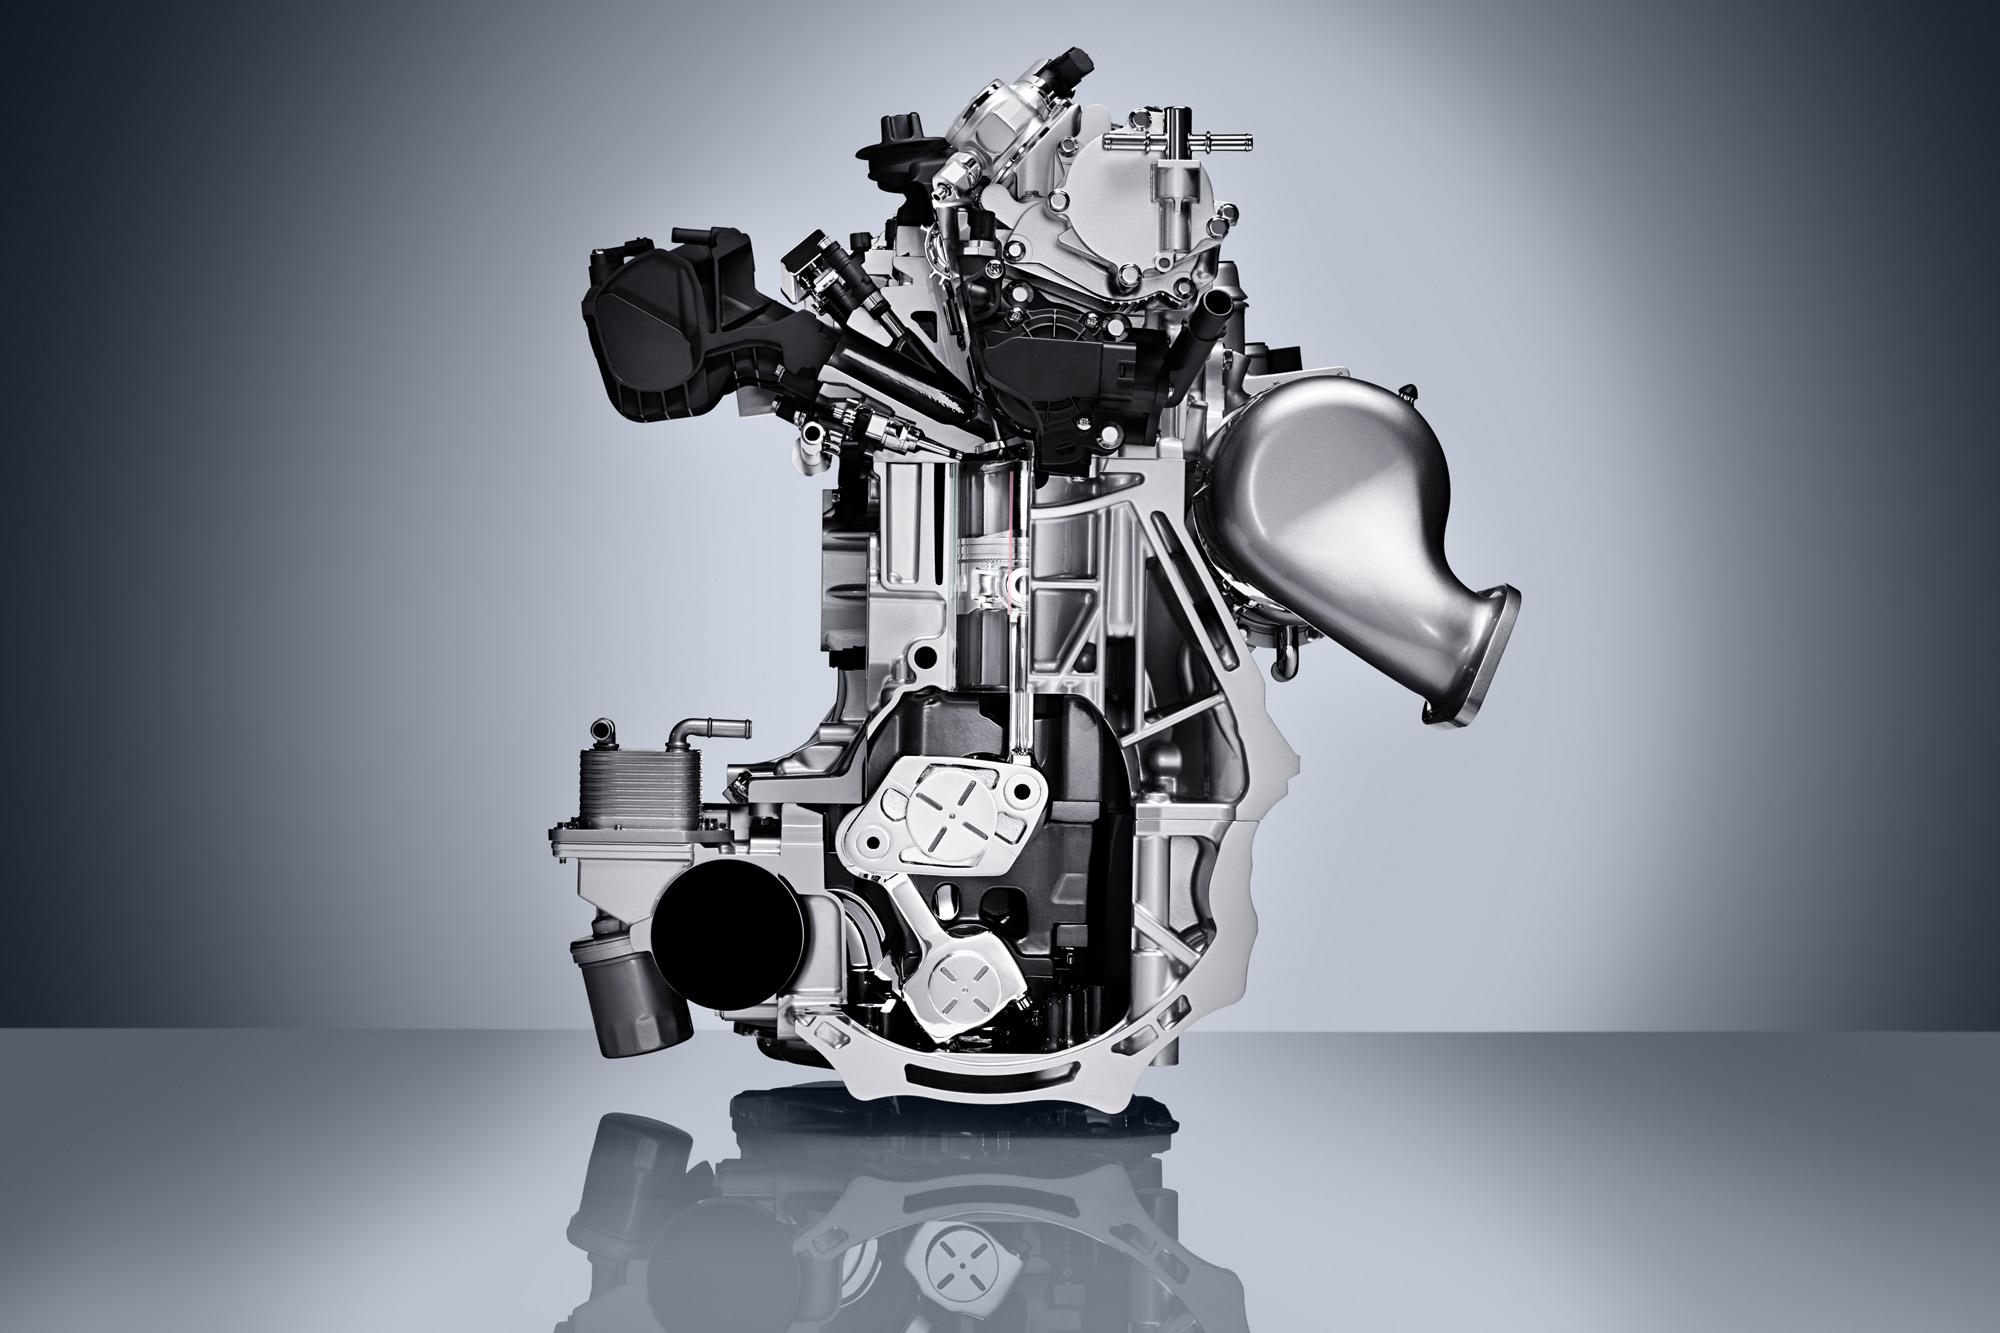 INFINITI Marks Global Debut of VC-Turbo Engine